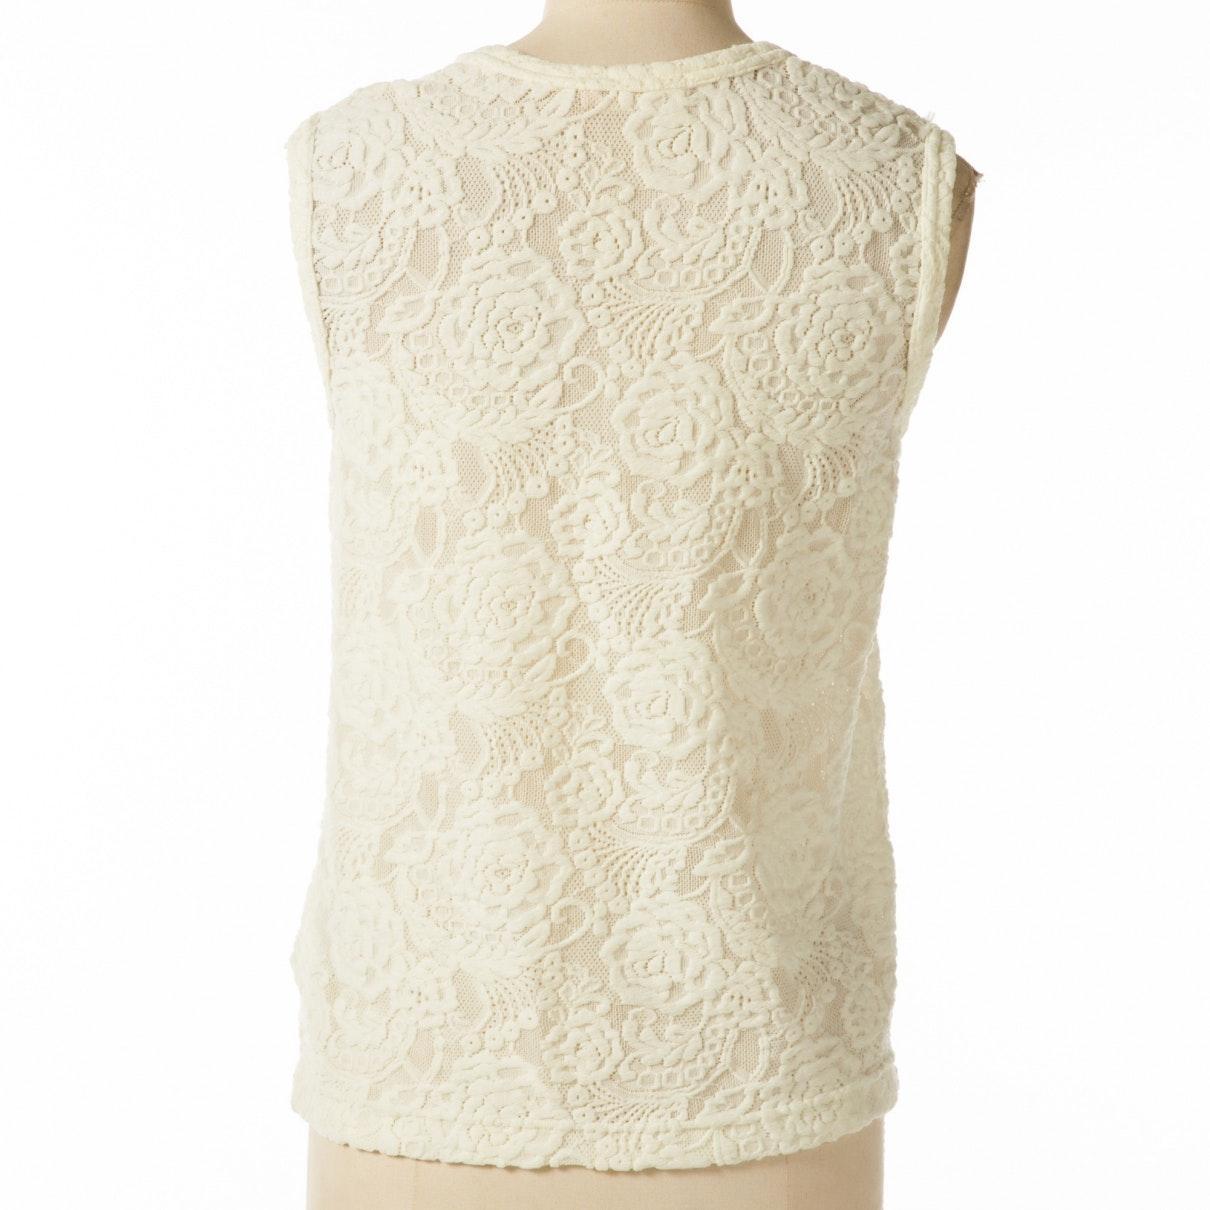 Camiseta Comme des Garçons de Tejido sintético de color Blanco